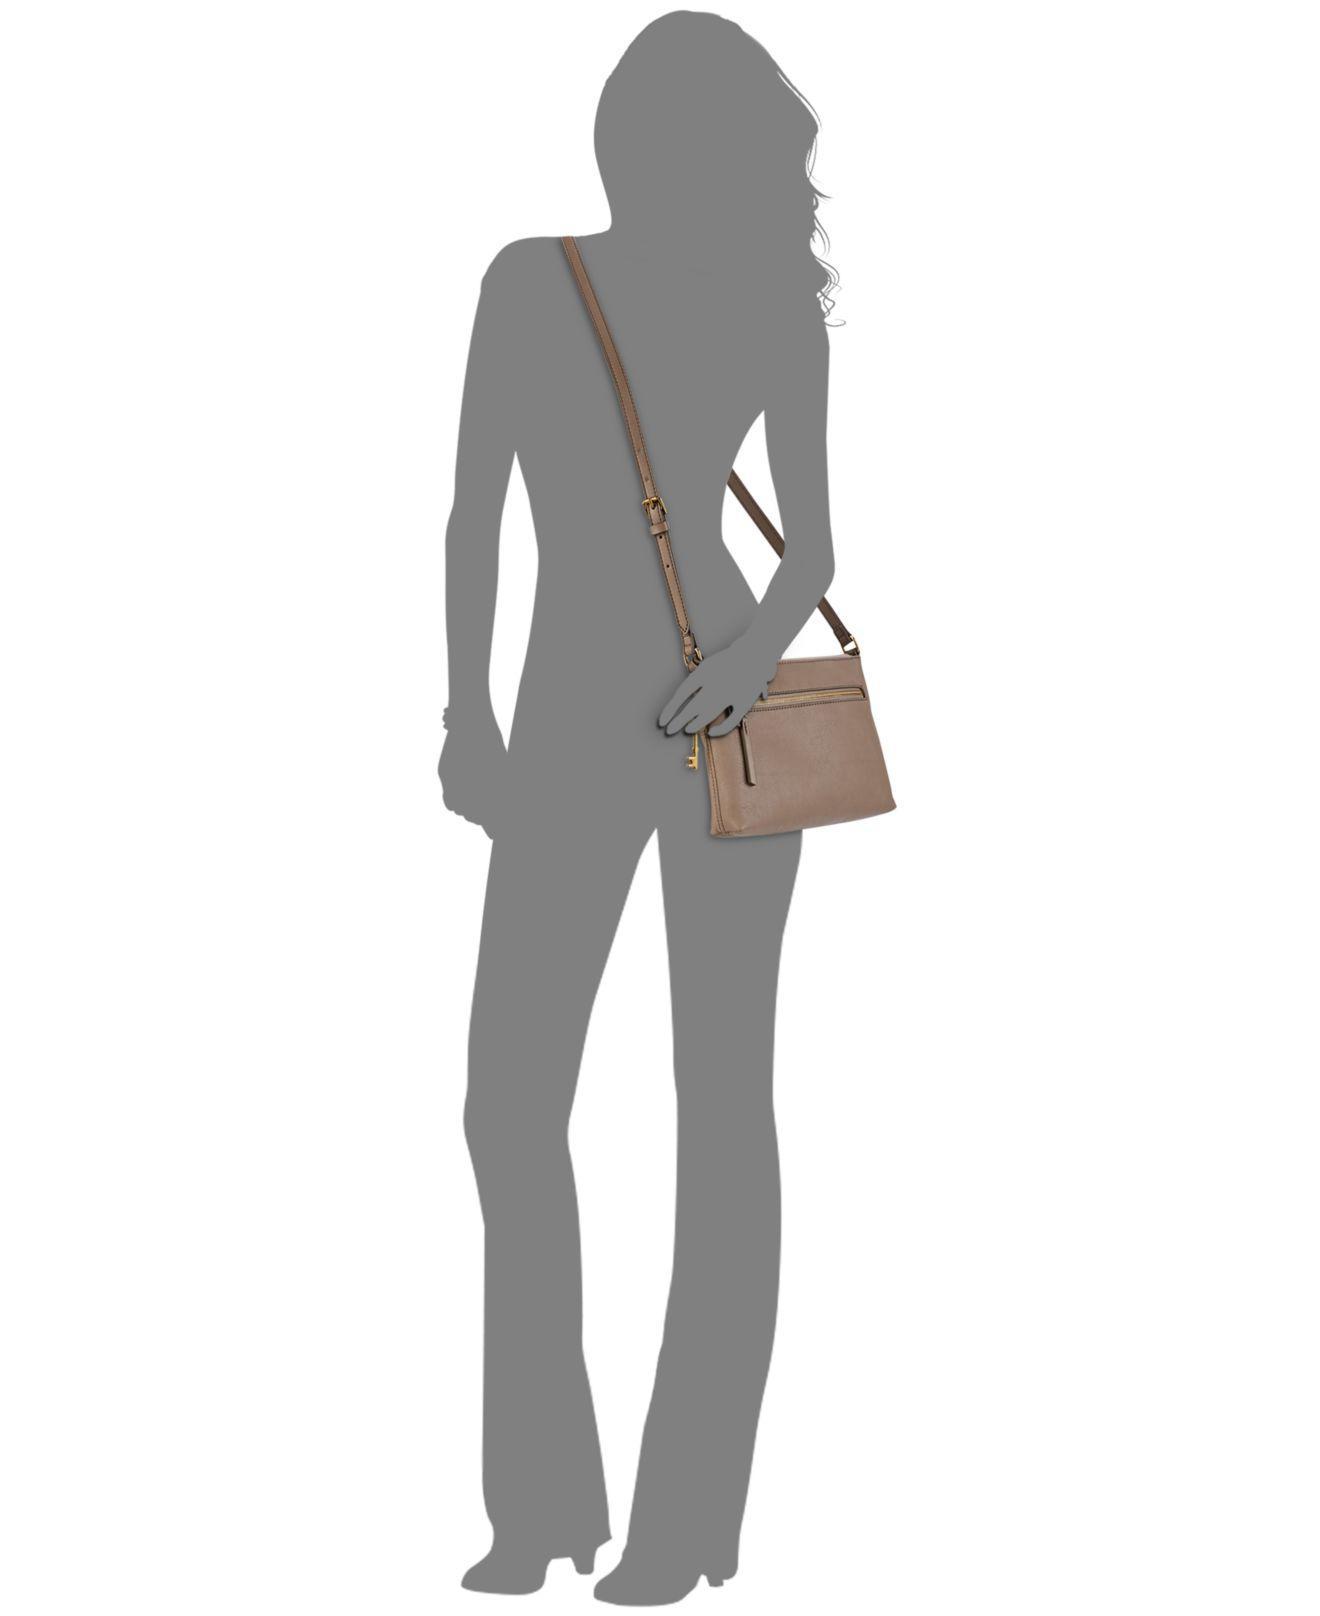 c5675ee3bc Lyst - Fossil Fiona Ew Crossbody Handbags Light Taupe - Save 9%